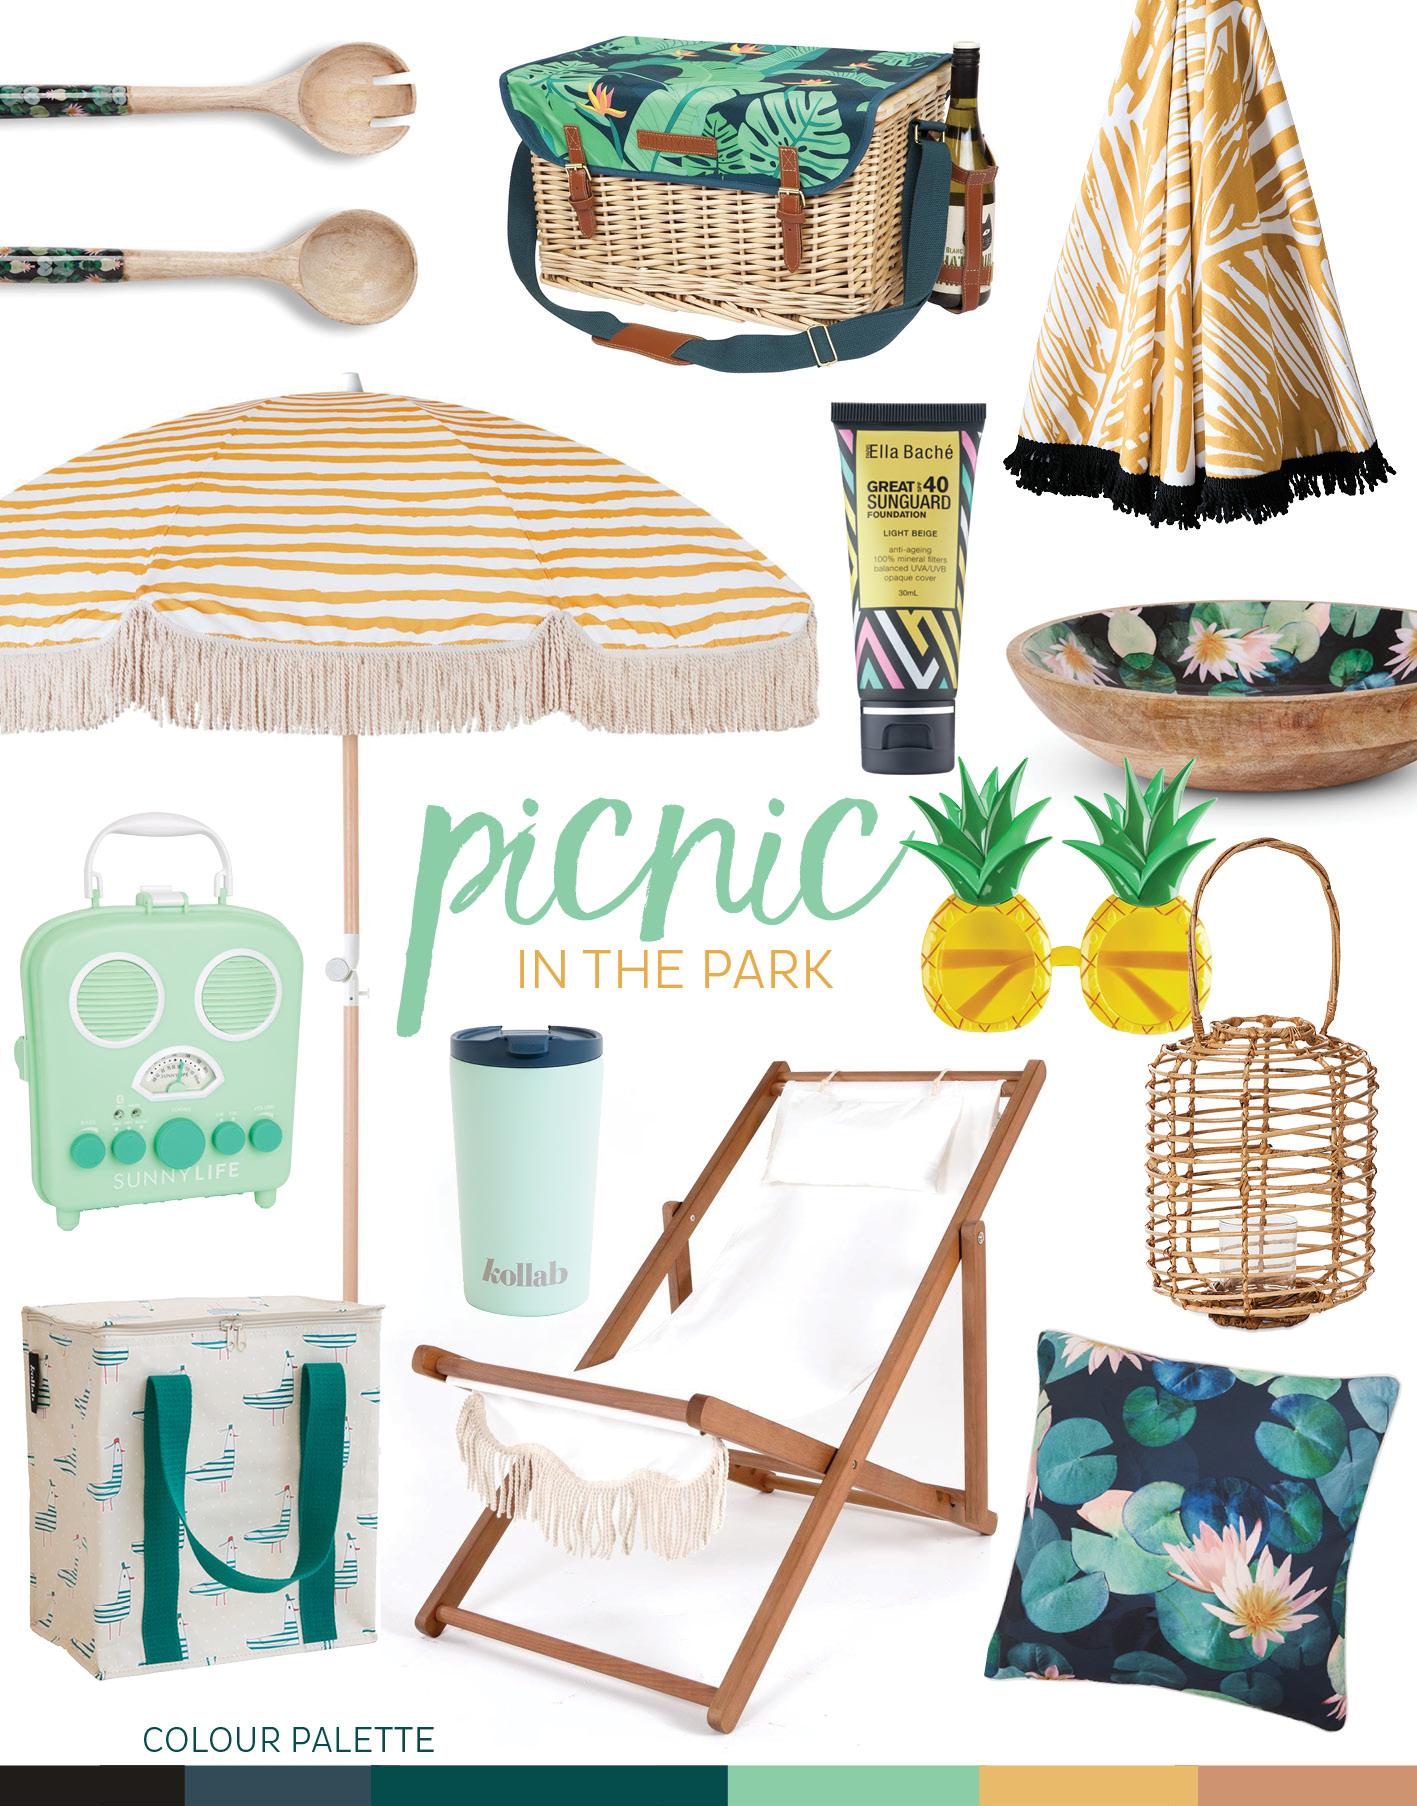 adore_home_blog_magazine_picnic_in_the_park_beach_outdoors_fun_summer_spring_alfresco.jpg